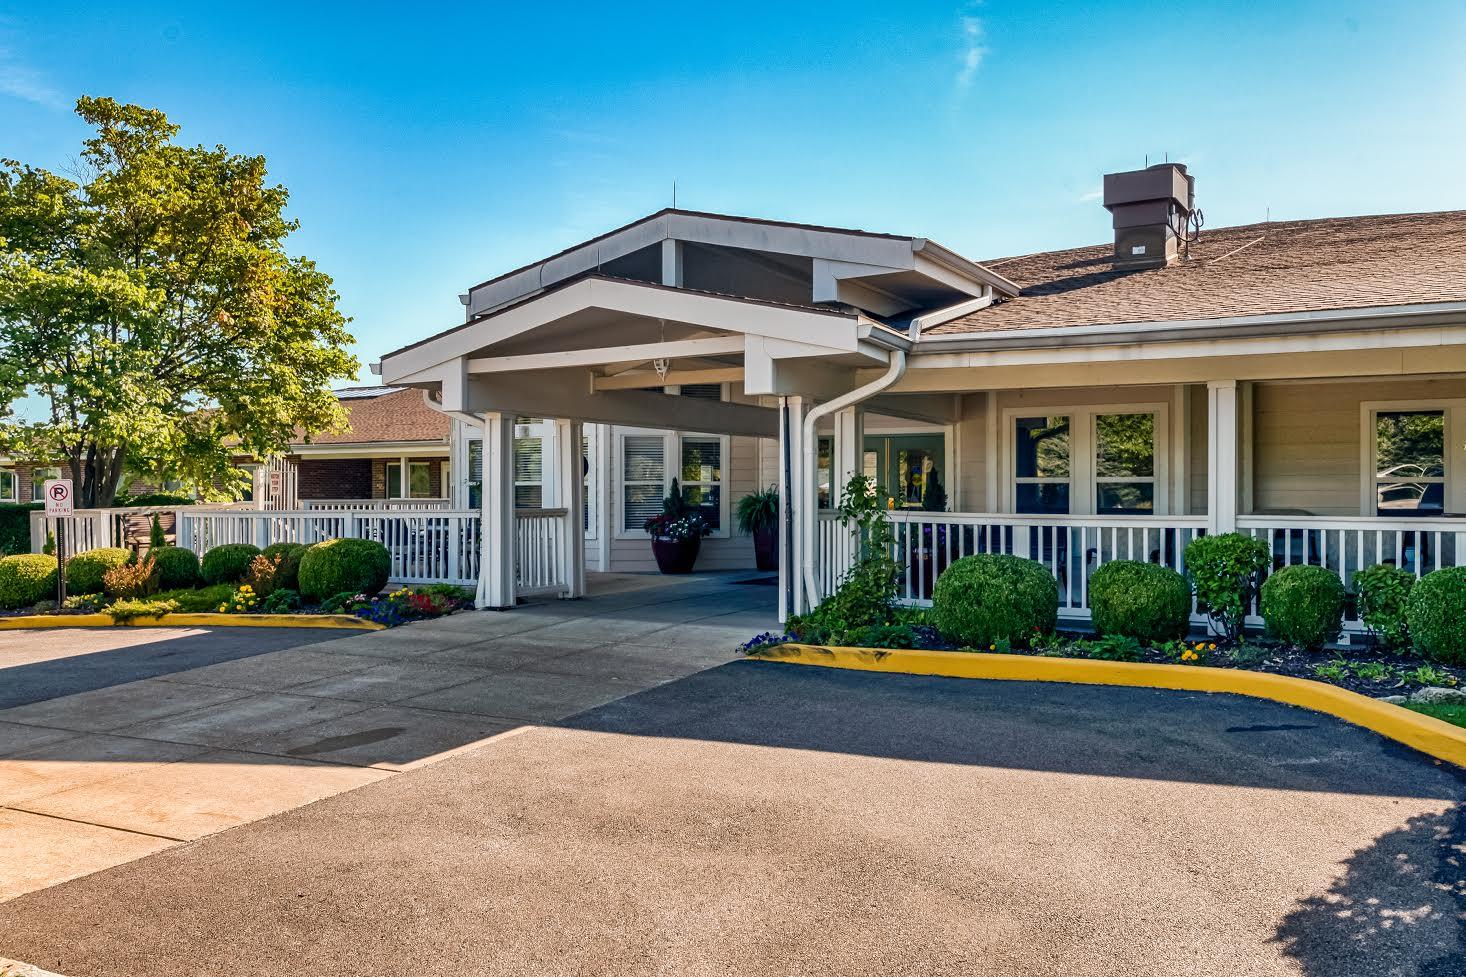 Missouri's Top Rated Local® Senior Living Communities Award Winner: Autumn View Gardens Ellisville